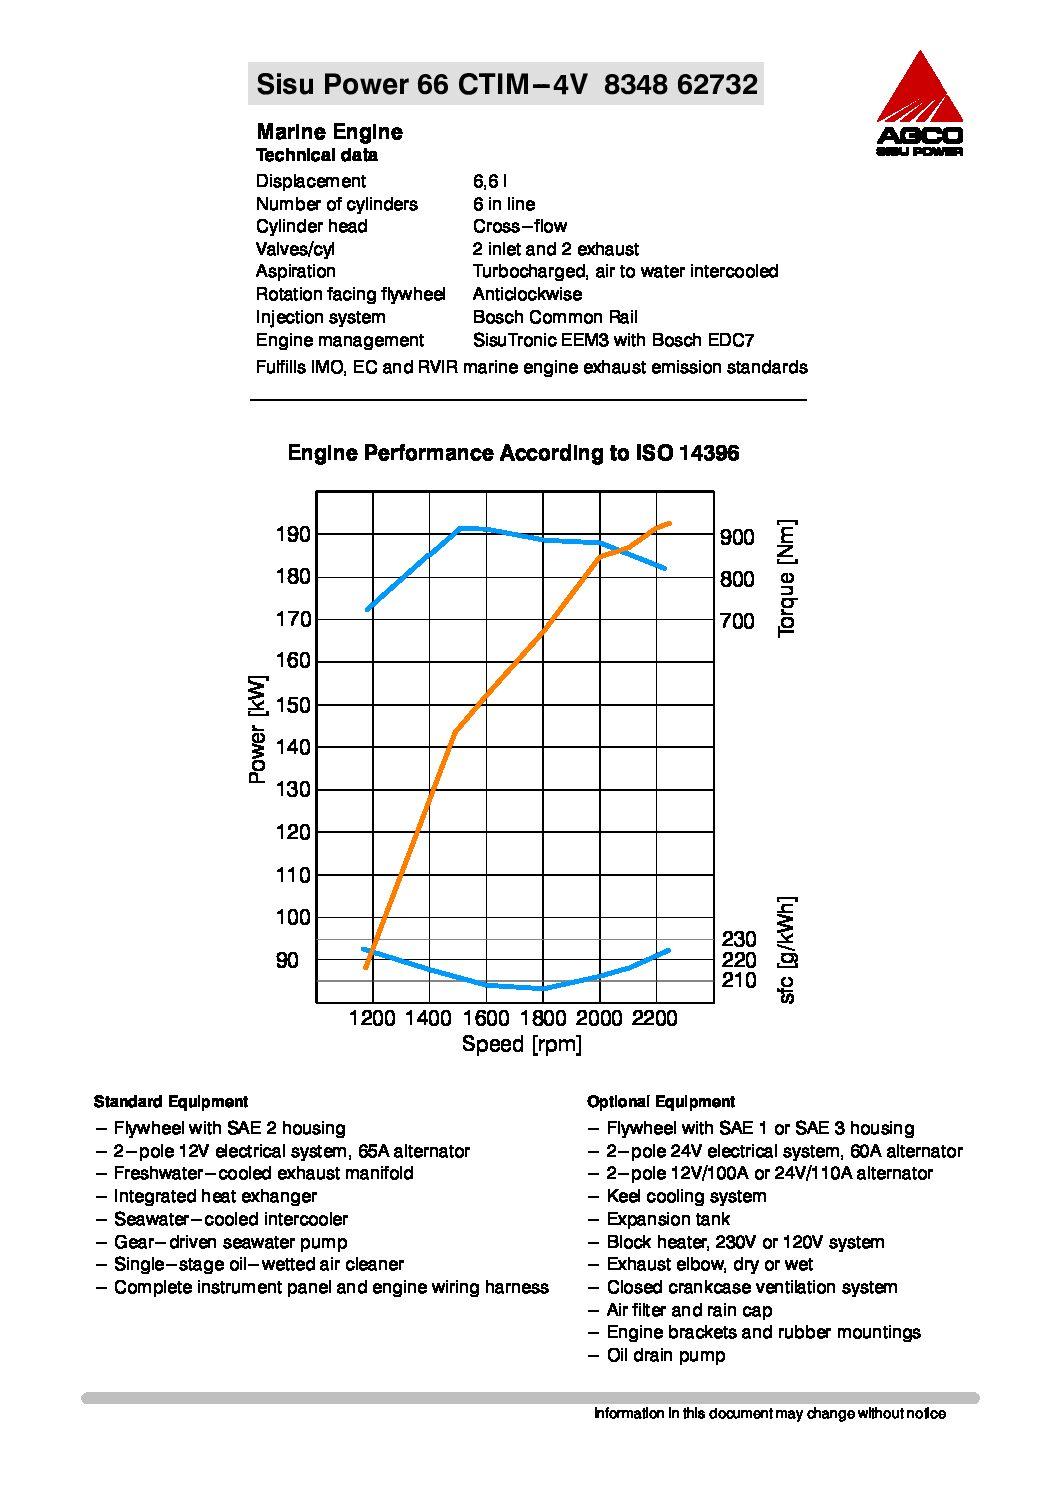 66 CTIM - data sheet